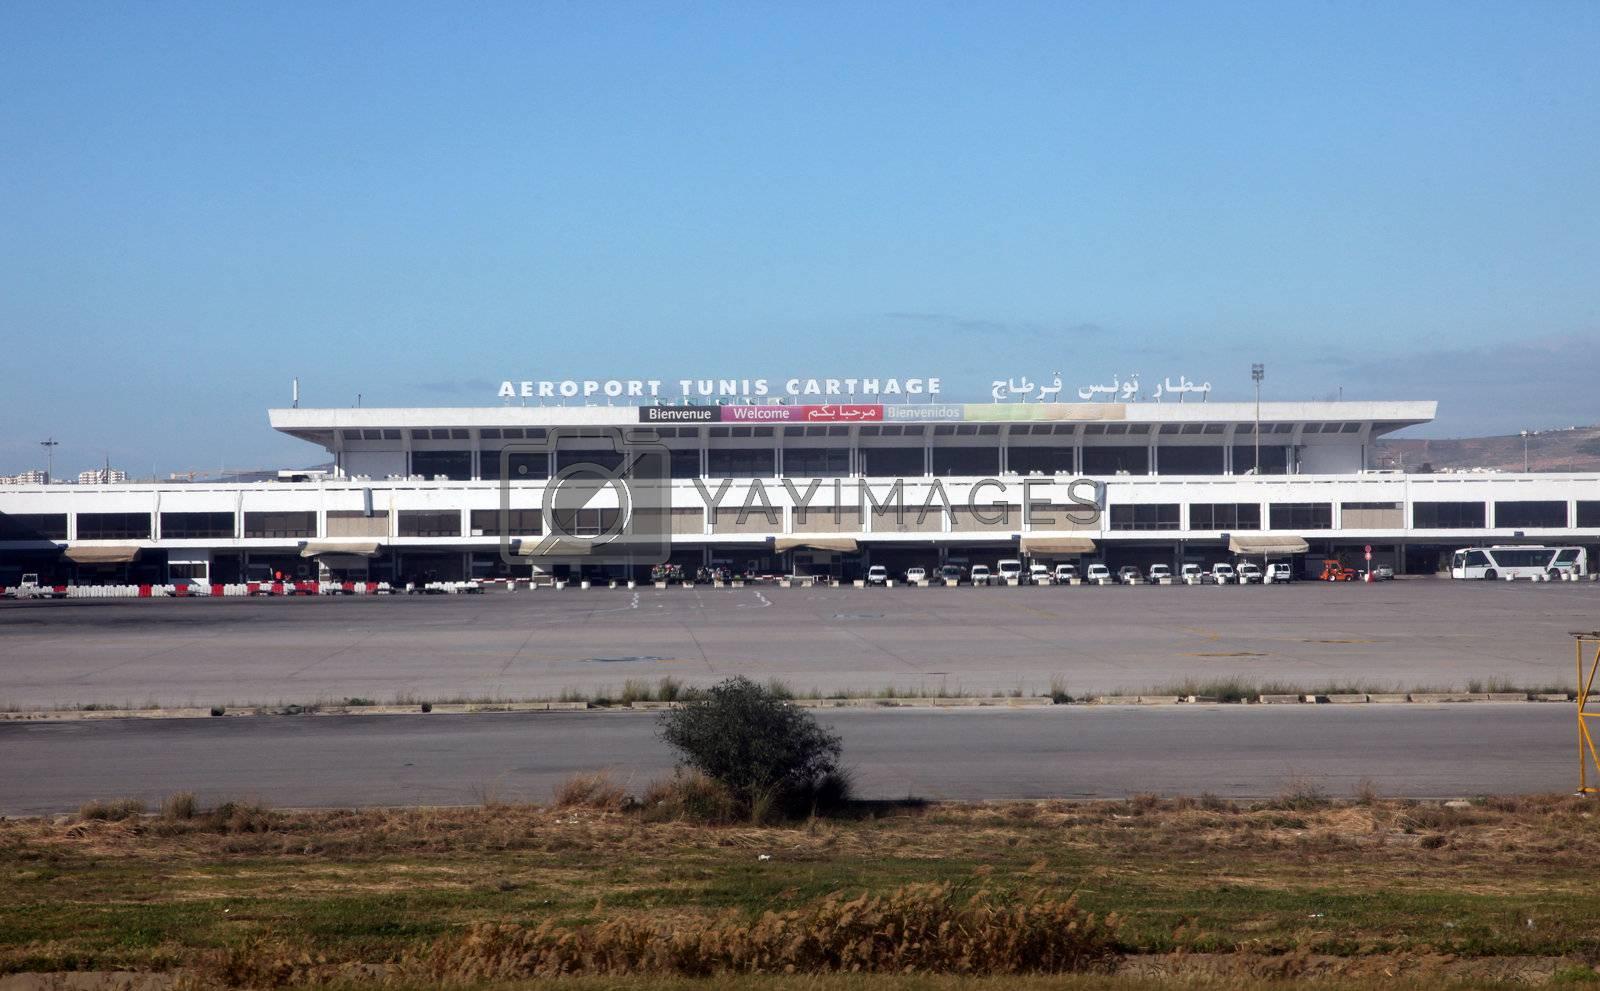 Tunis Carthage airport